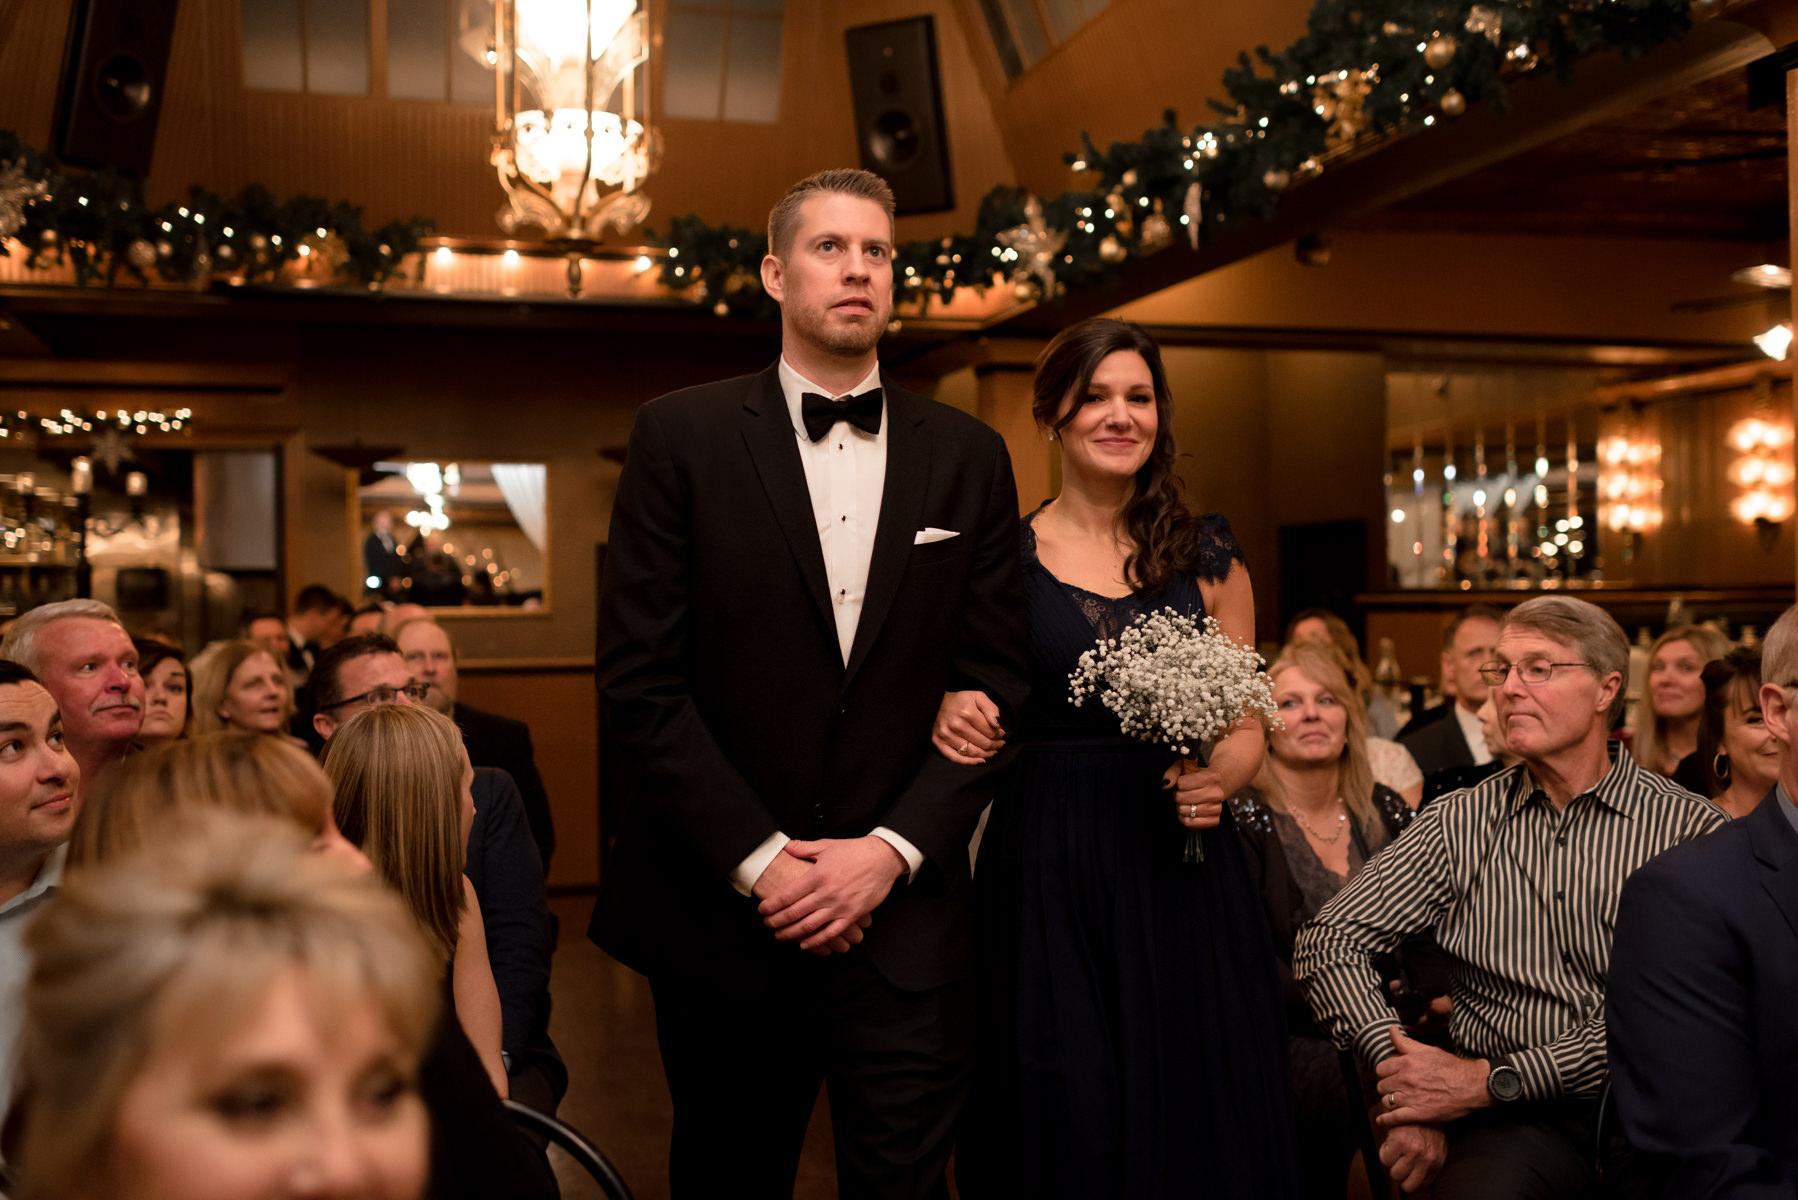 Andrew Tat - Documentary Wedding Photography - Lake Union Cafe - Seattle, Washington -Rachel and Ryan - 06.jpg